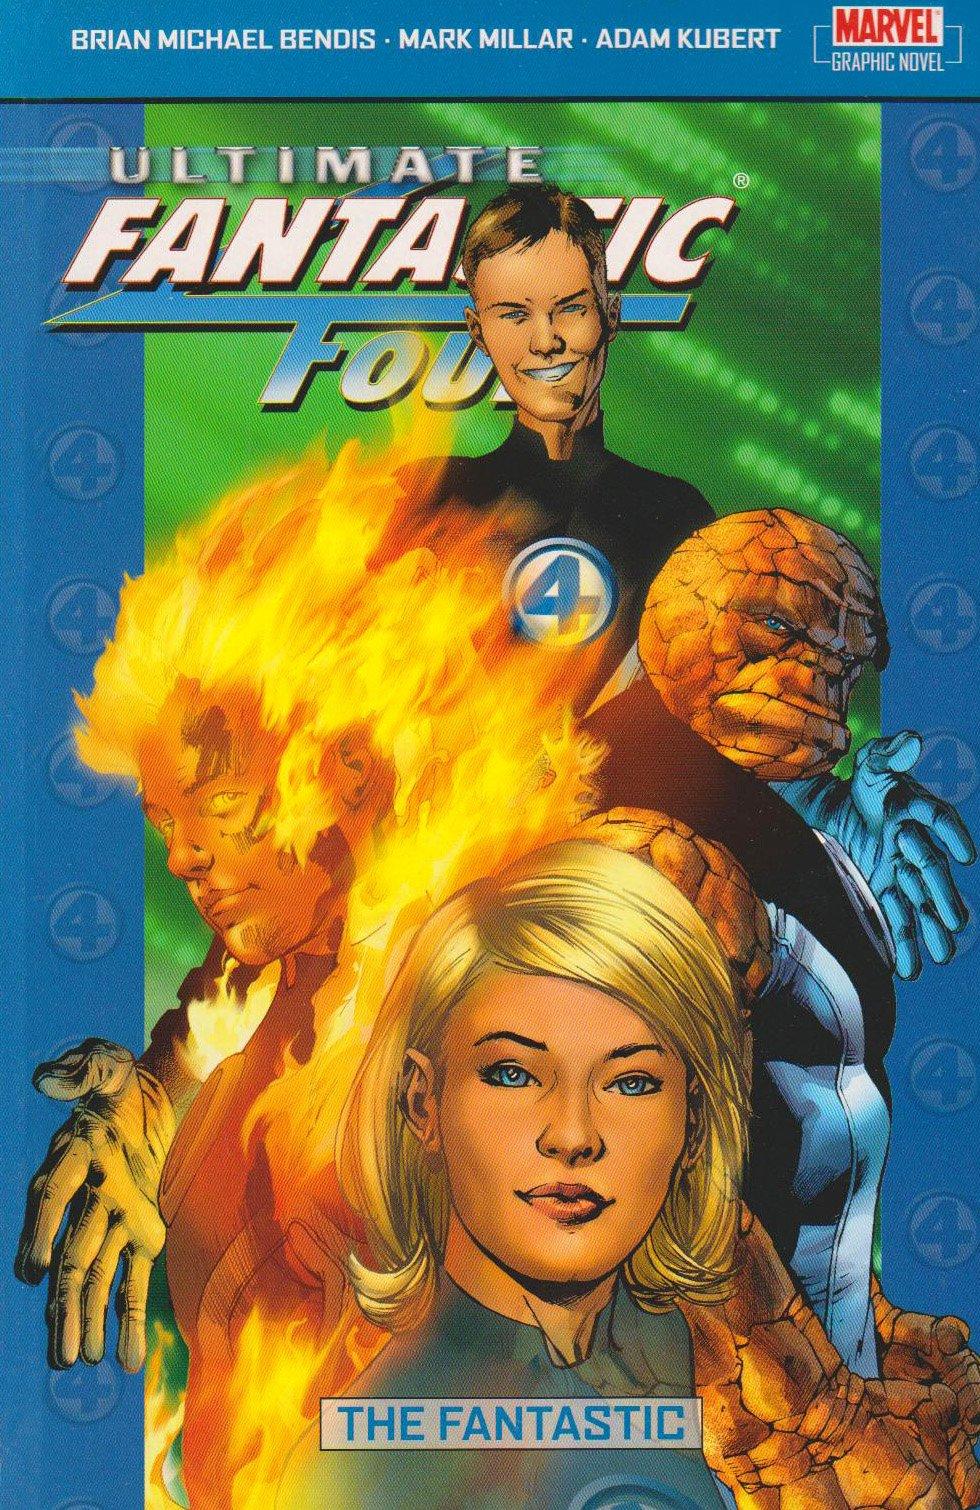 Ultimate Fantastic Four: Ultimate Fantastic Four Vol.1: The Fantastic Fantastic Vol. 1 (v. 1) pdf